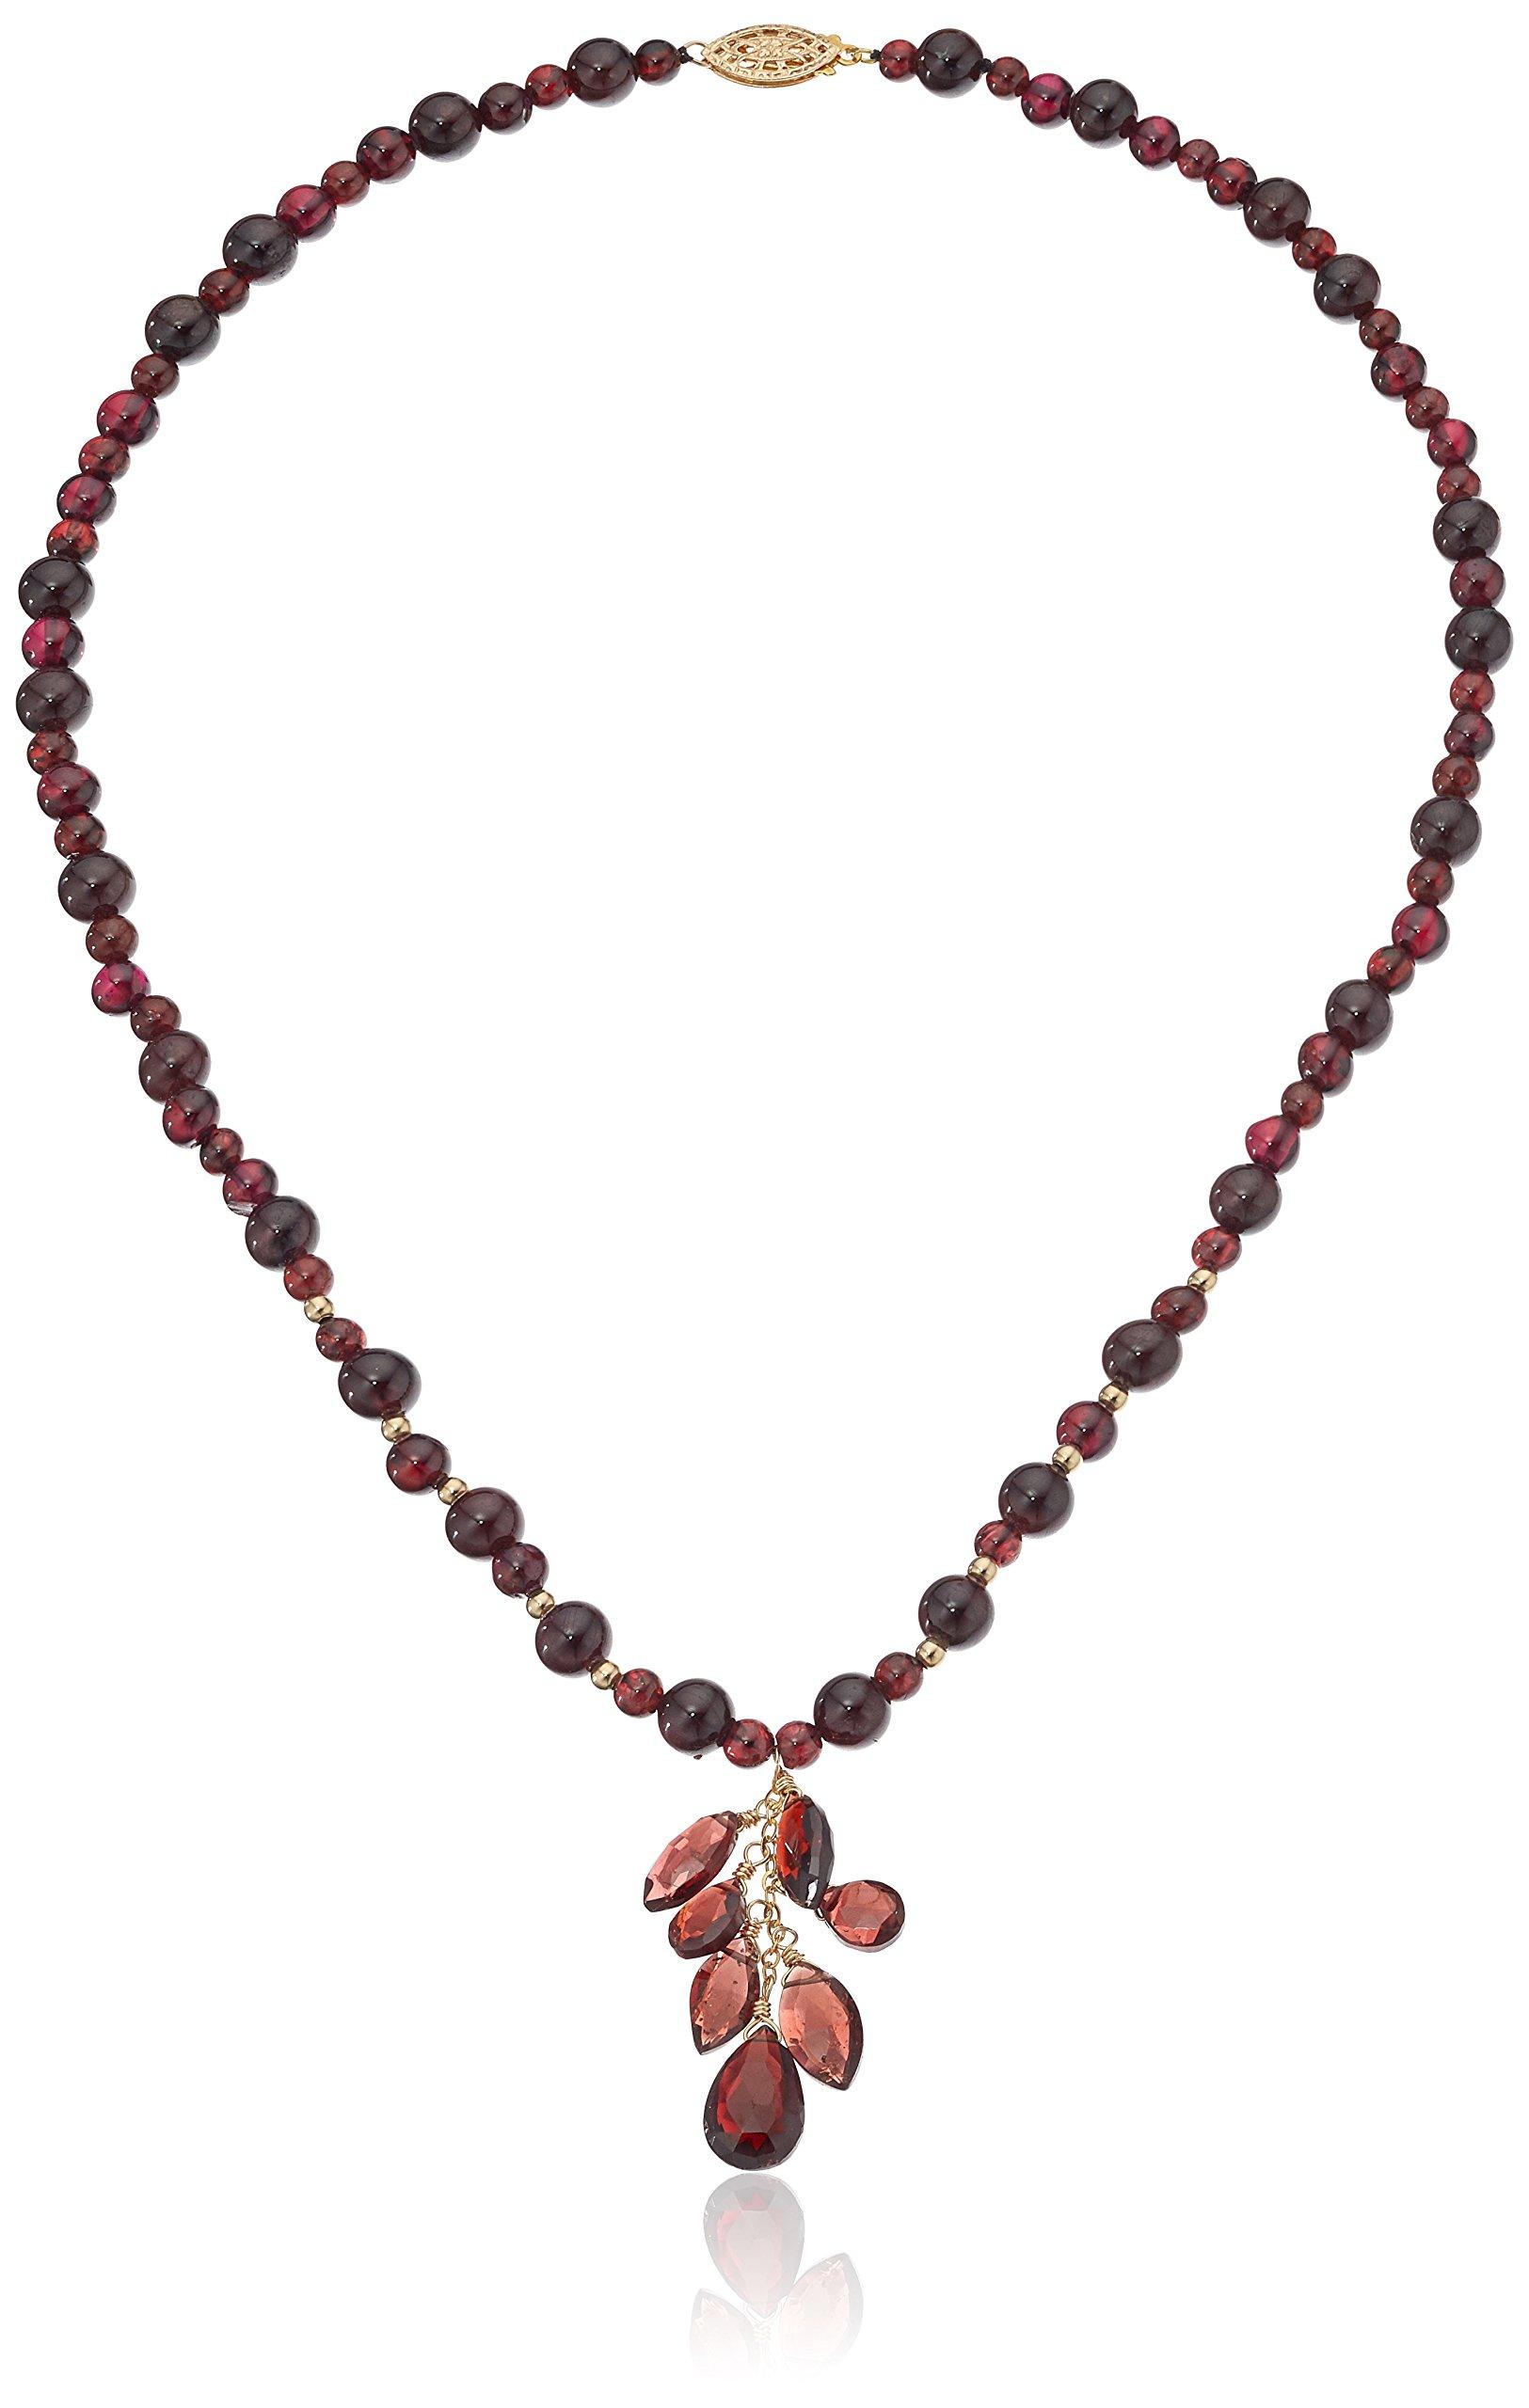 Handmade Beaded Garnet with Multi-Navette and Teardrop Center Shower Strand Necklace, 16''